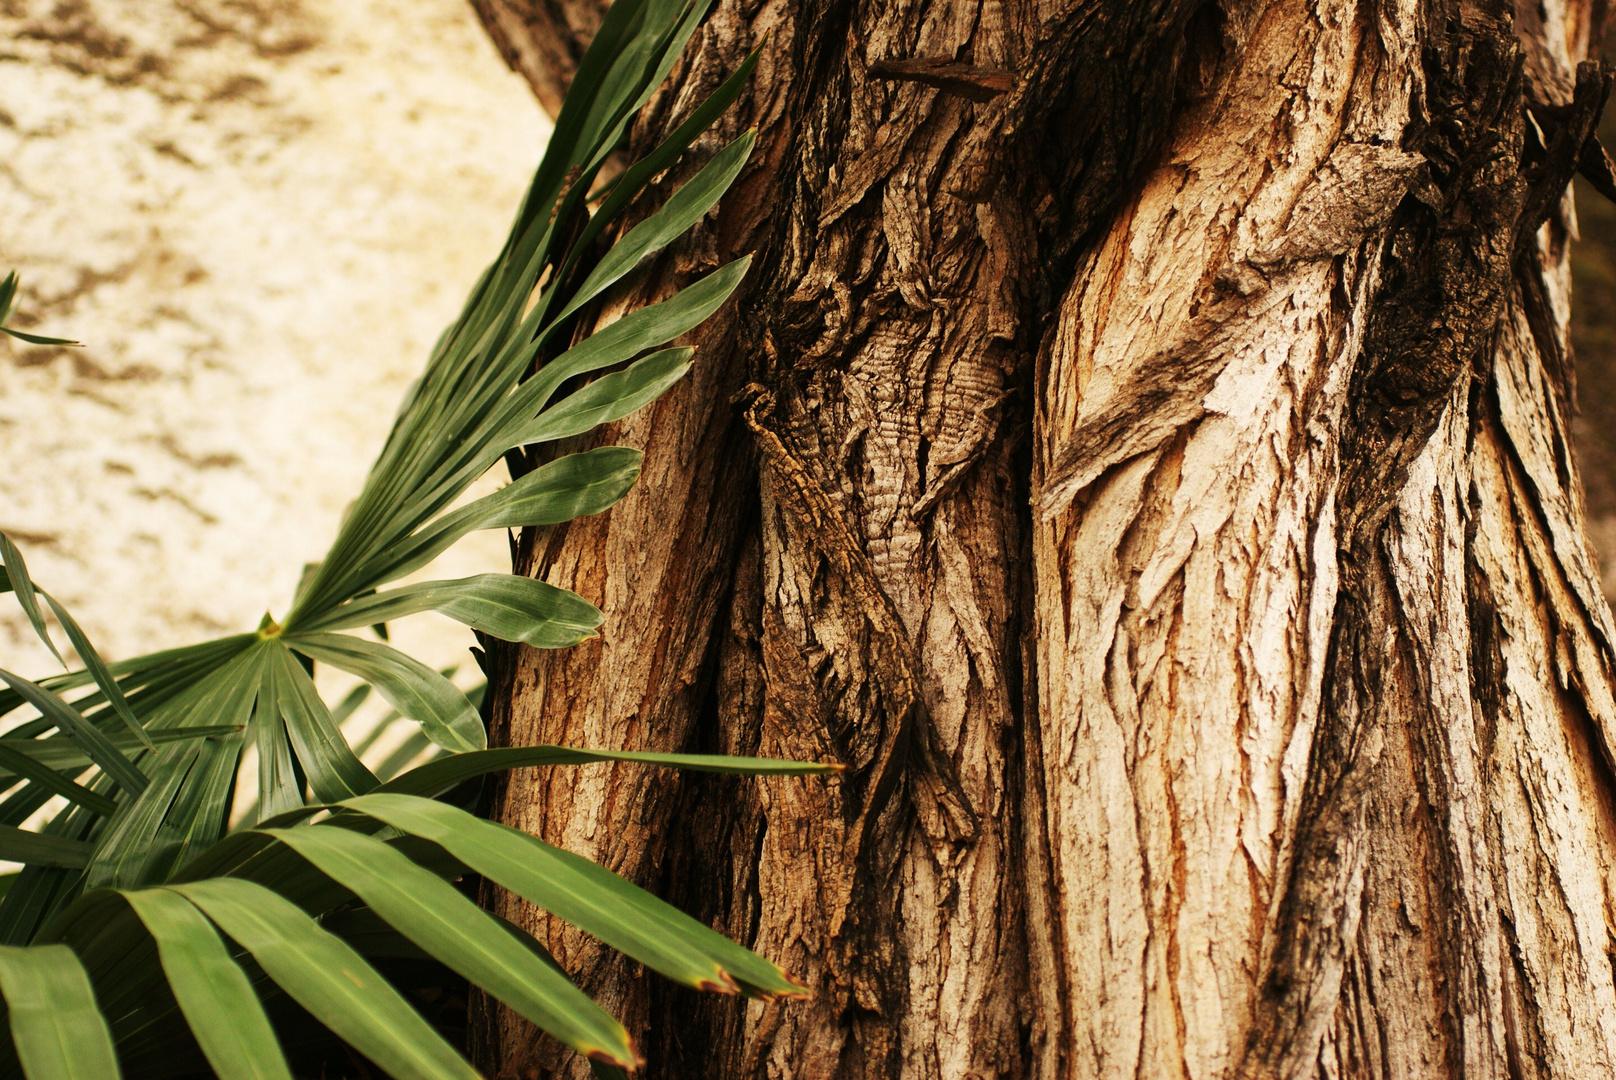 Olivenbaum und Palmenblatt